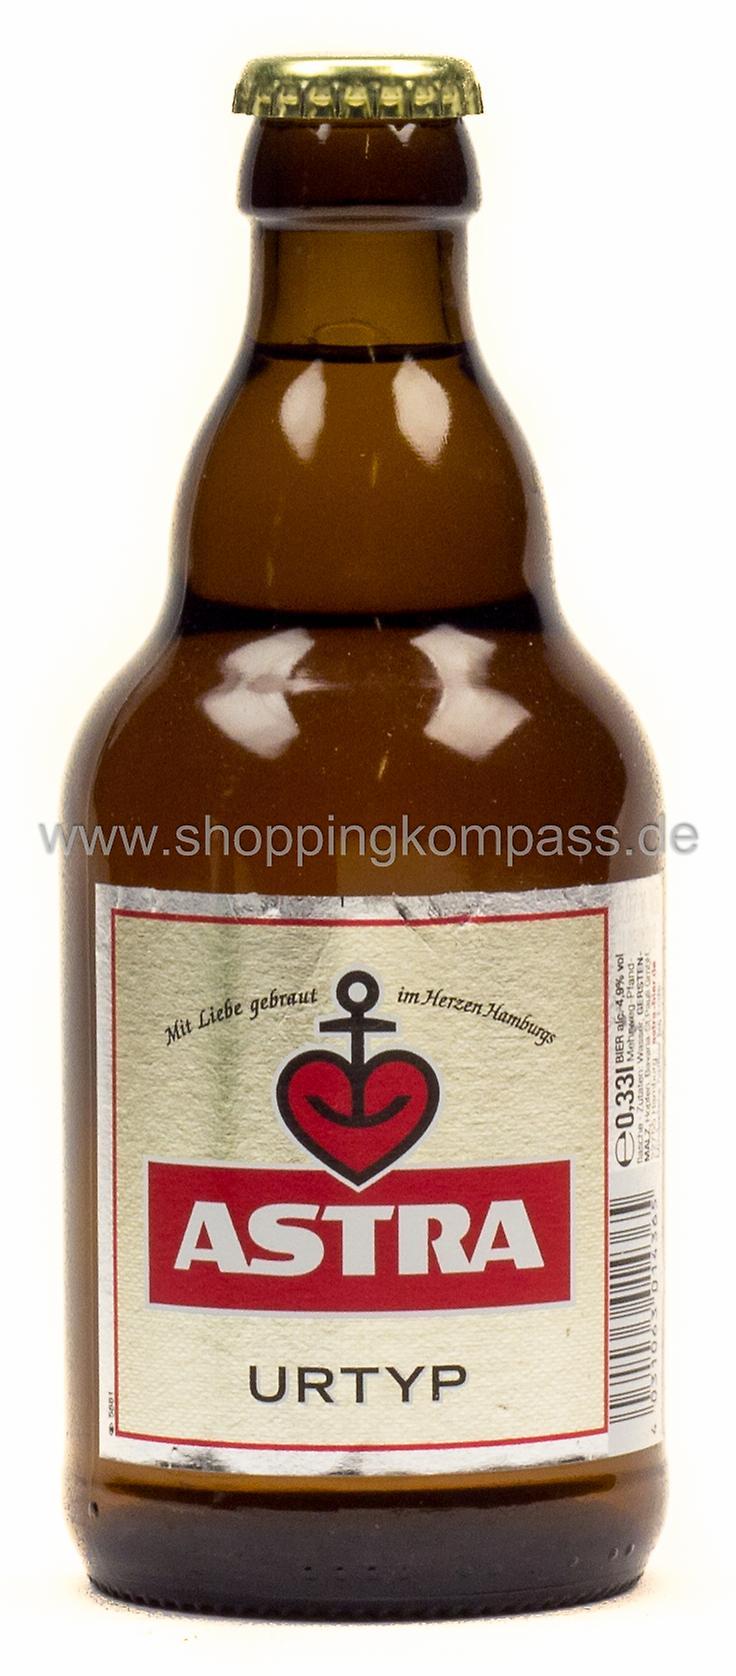 Astra Urtyp Pils Steini 0,33 l Glas Mehrweg